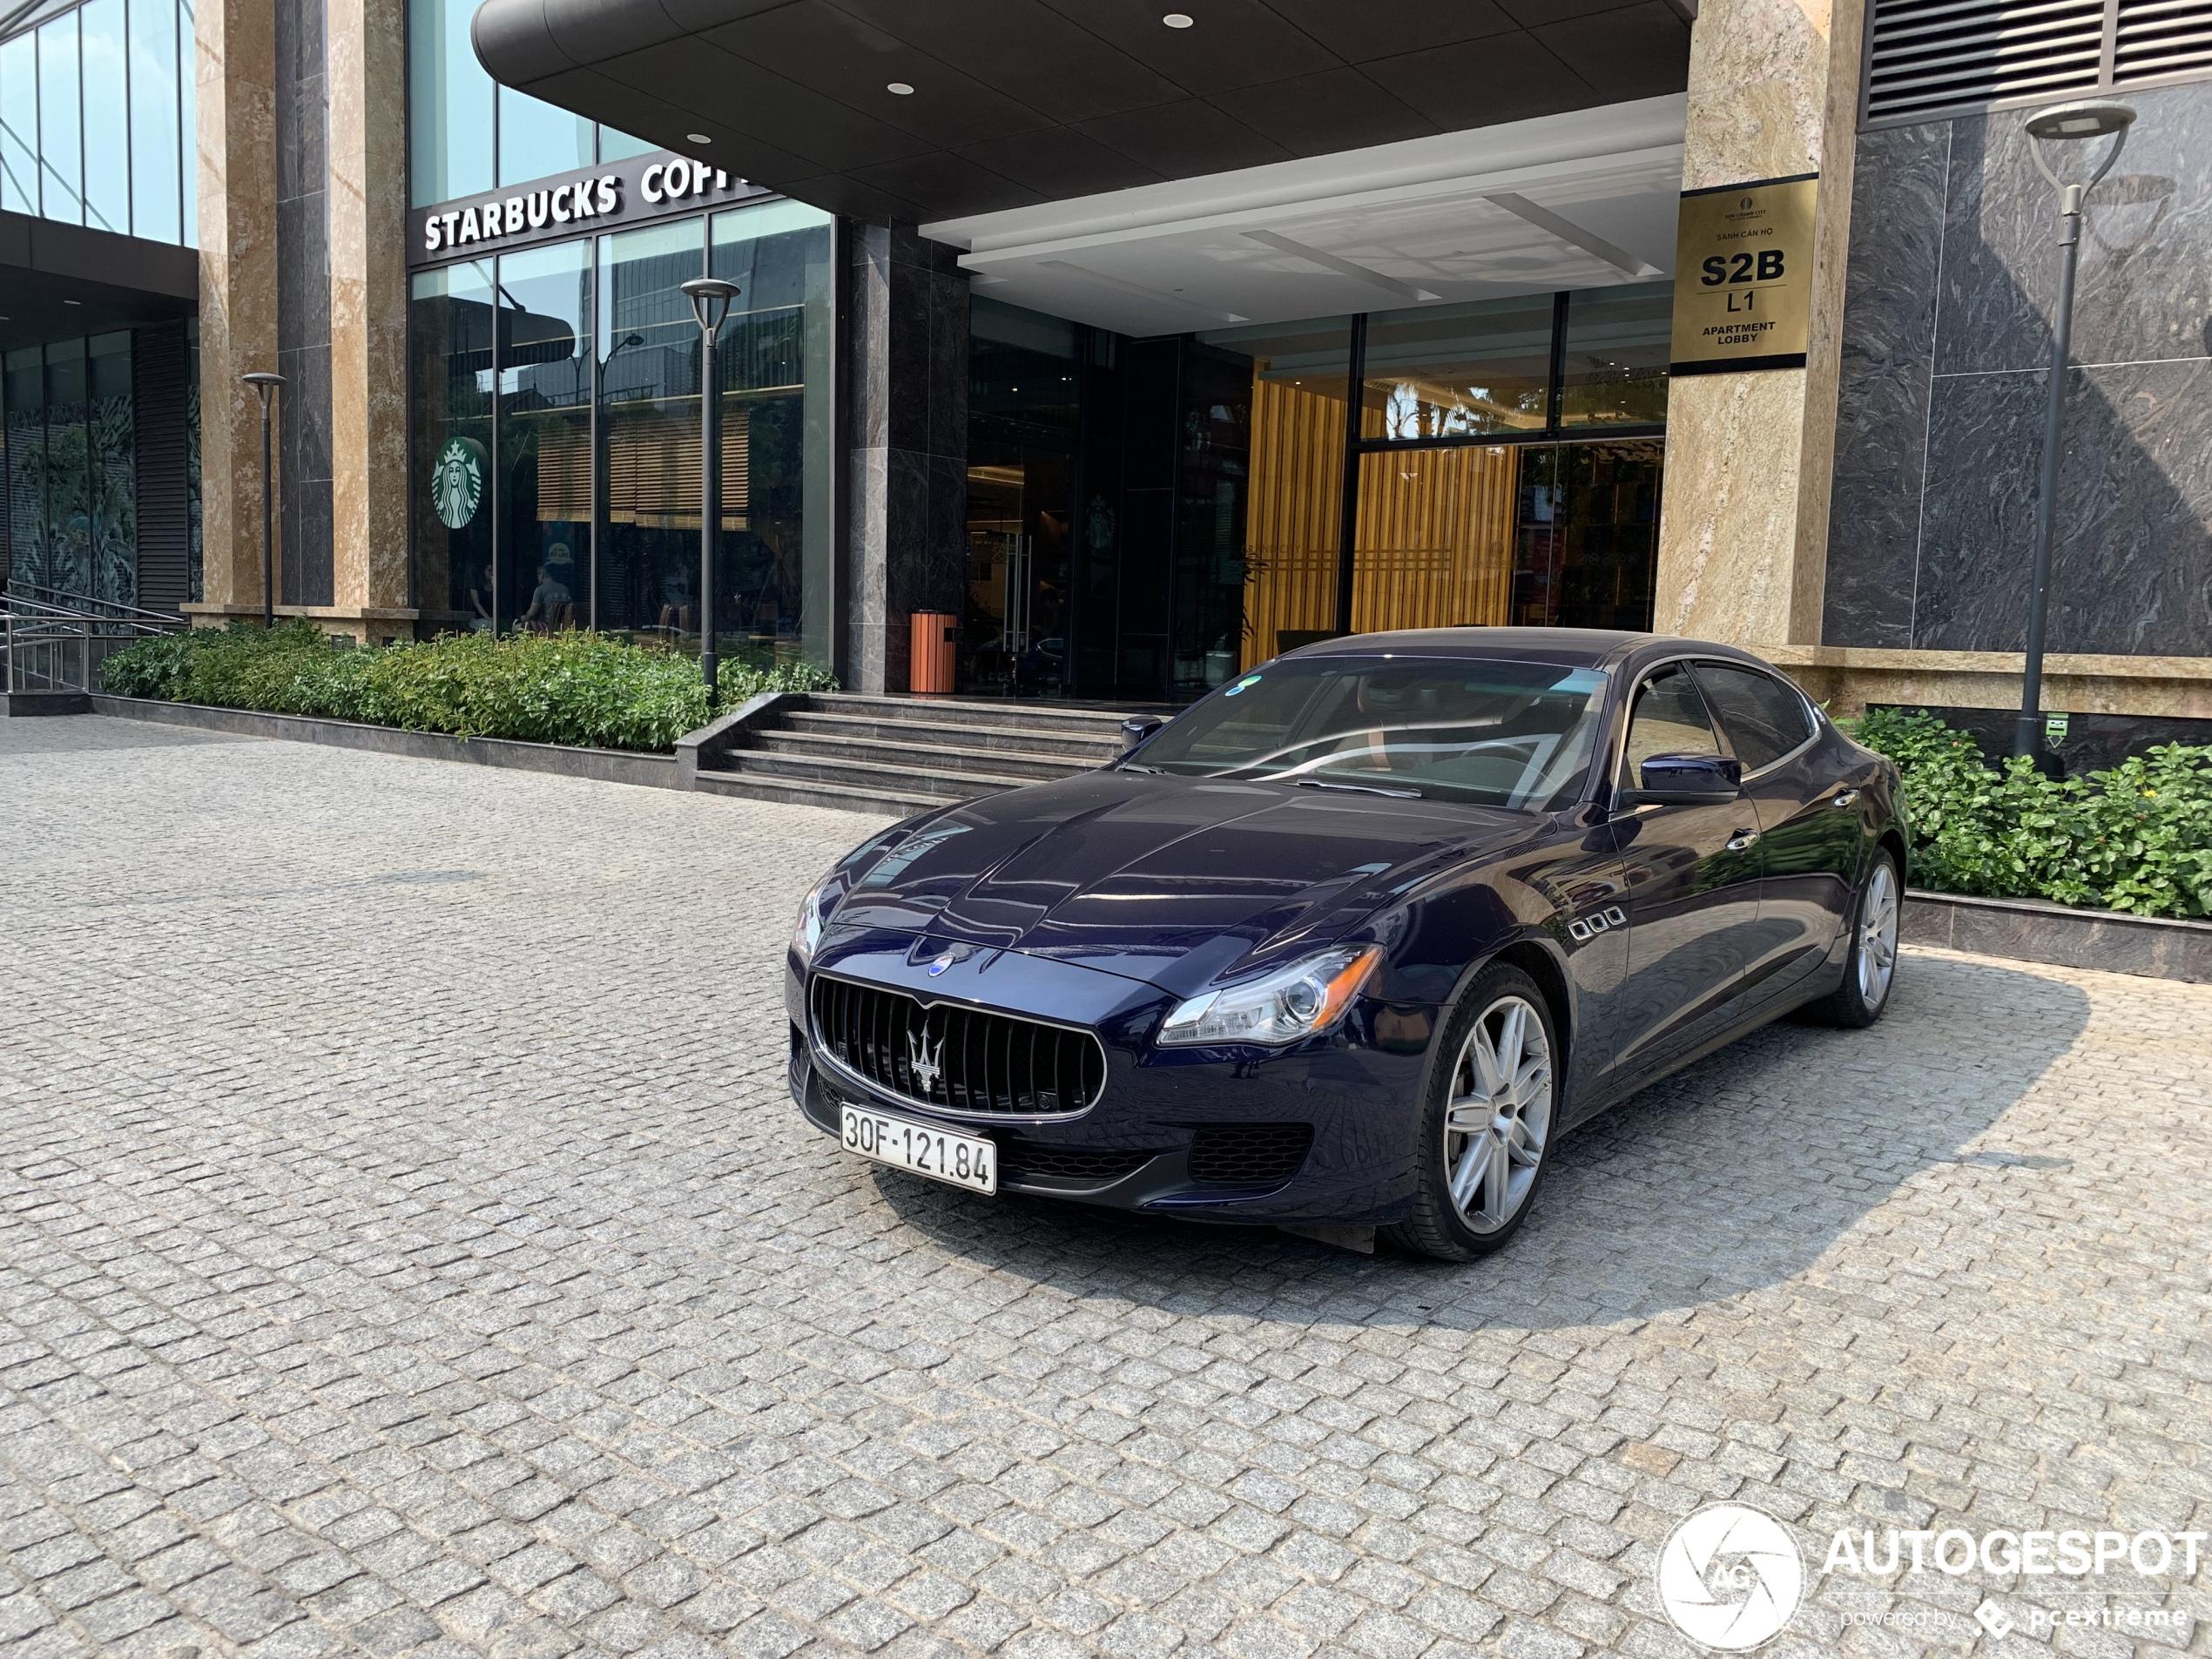 Maserati Quattroporte Diesel 2017 - 31 maart 2020 - Autogespot